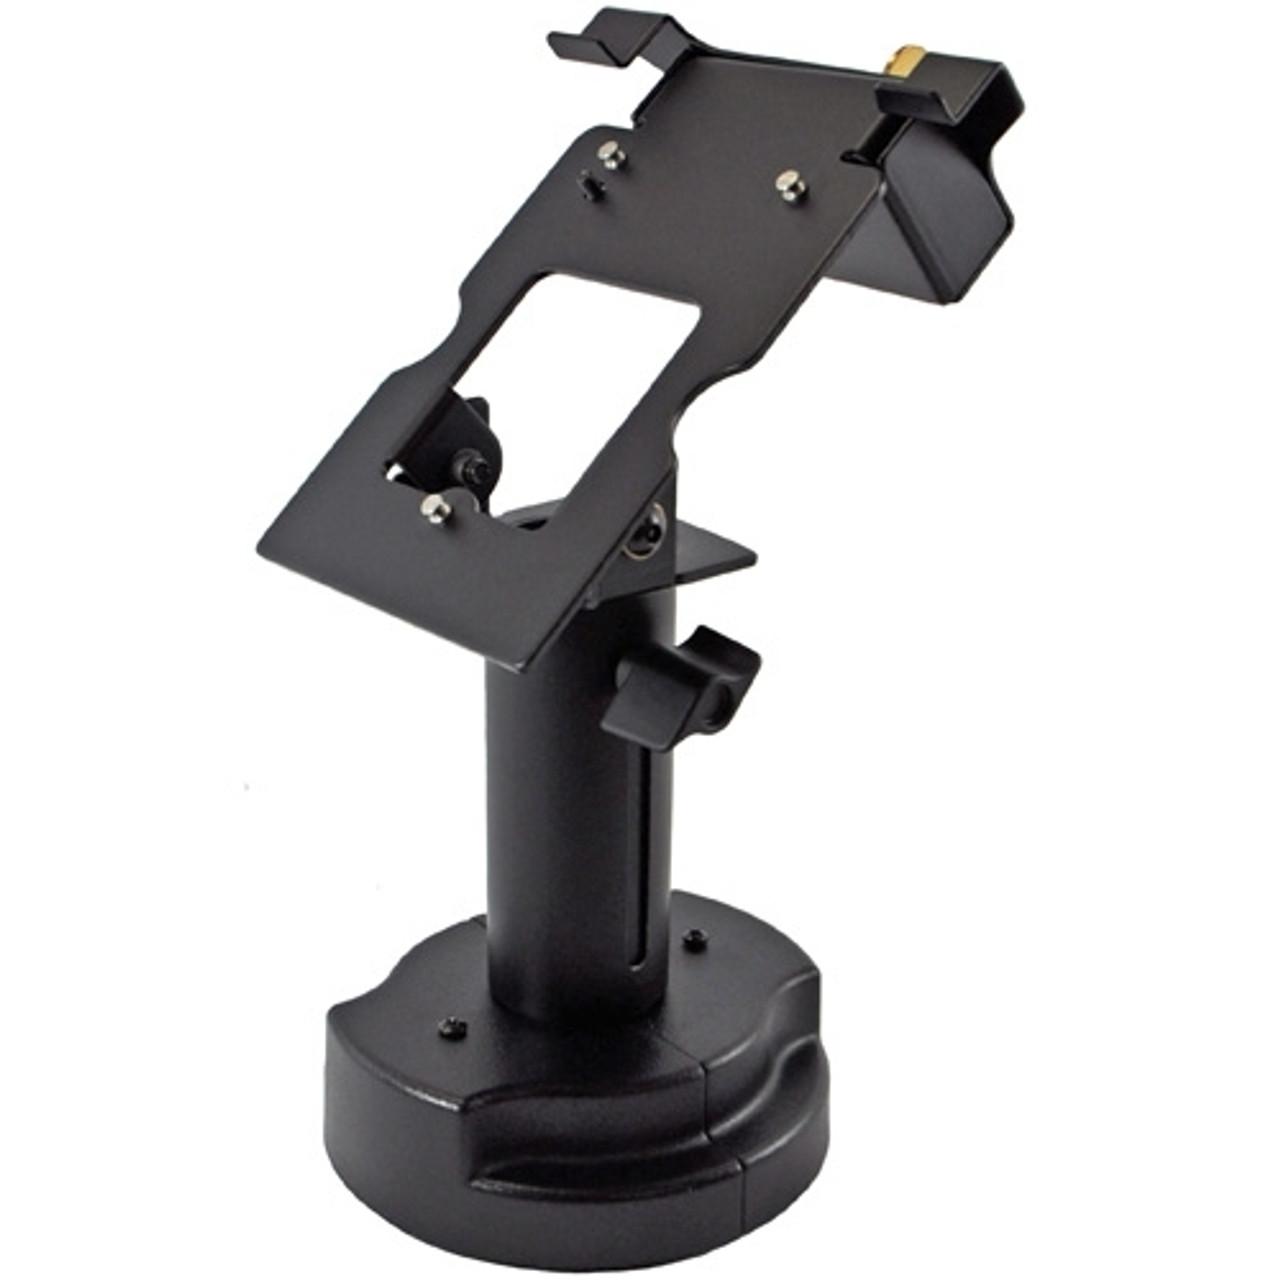 Swivel Stands Credit Card Stand Locking Telescoping Pedestal VeriFone MX850